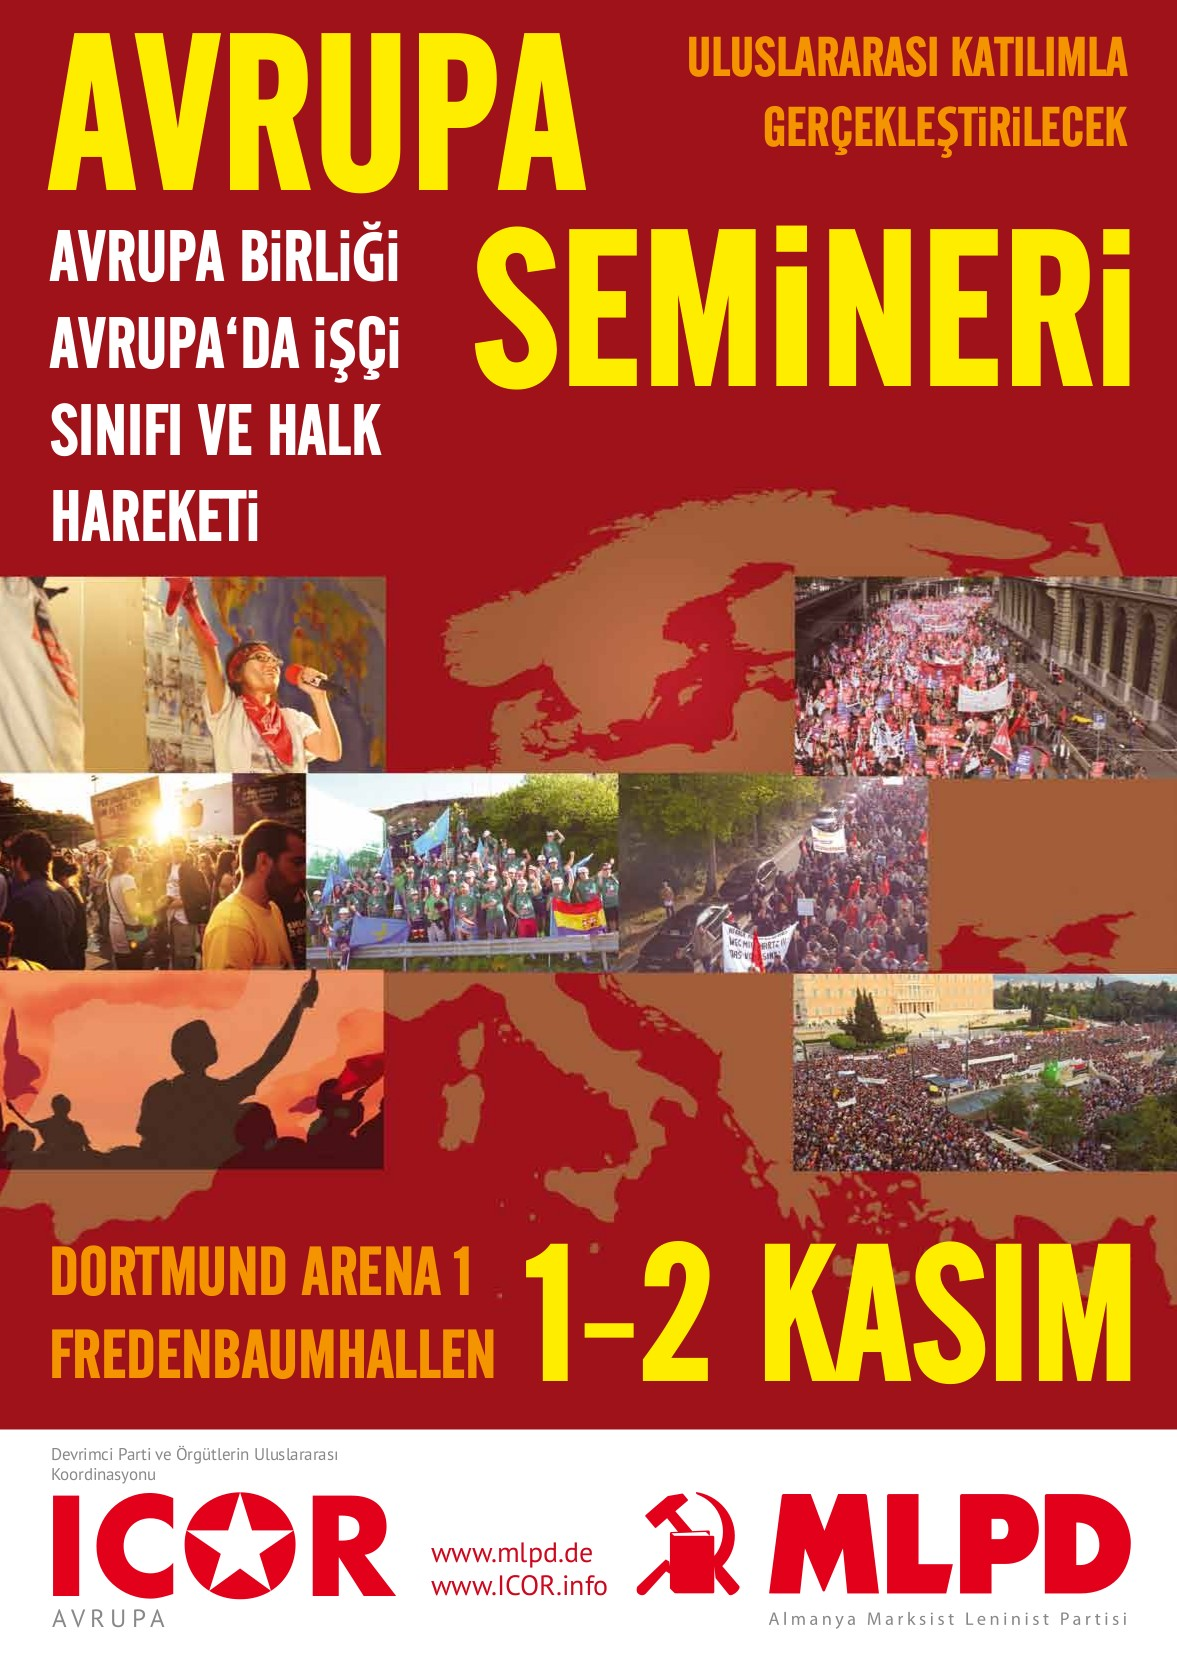 ICOR Avrupa ve MLPD'nin ortak Avrupa Semineri için posteri (in Turkish: Poster of the joint Europe Seminar ICOR Europe and MLPD Germany)